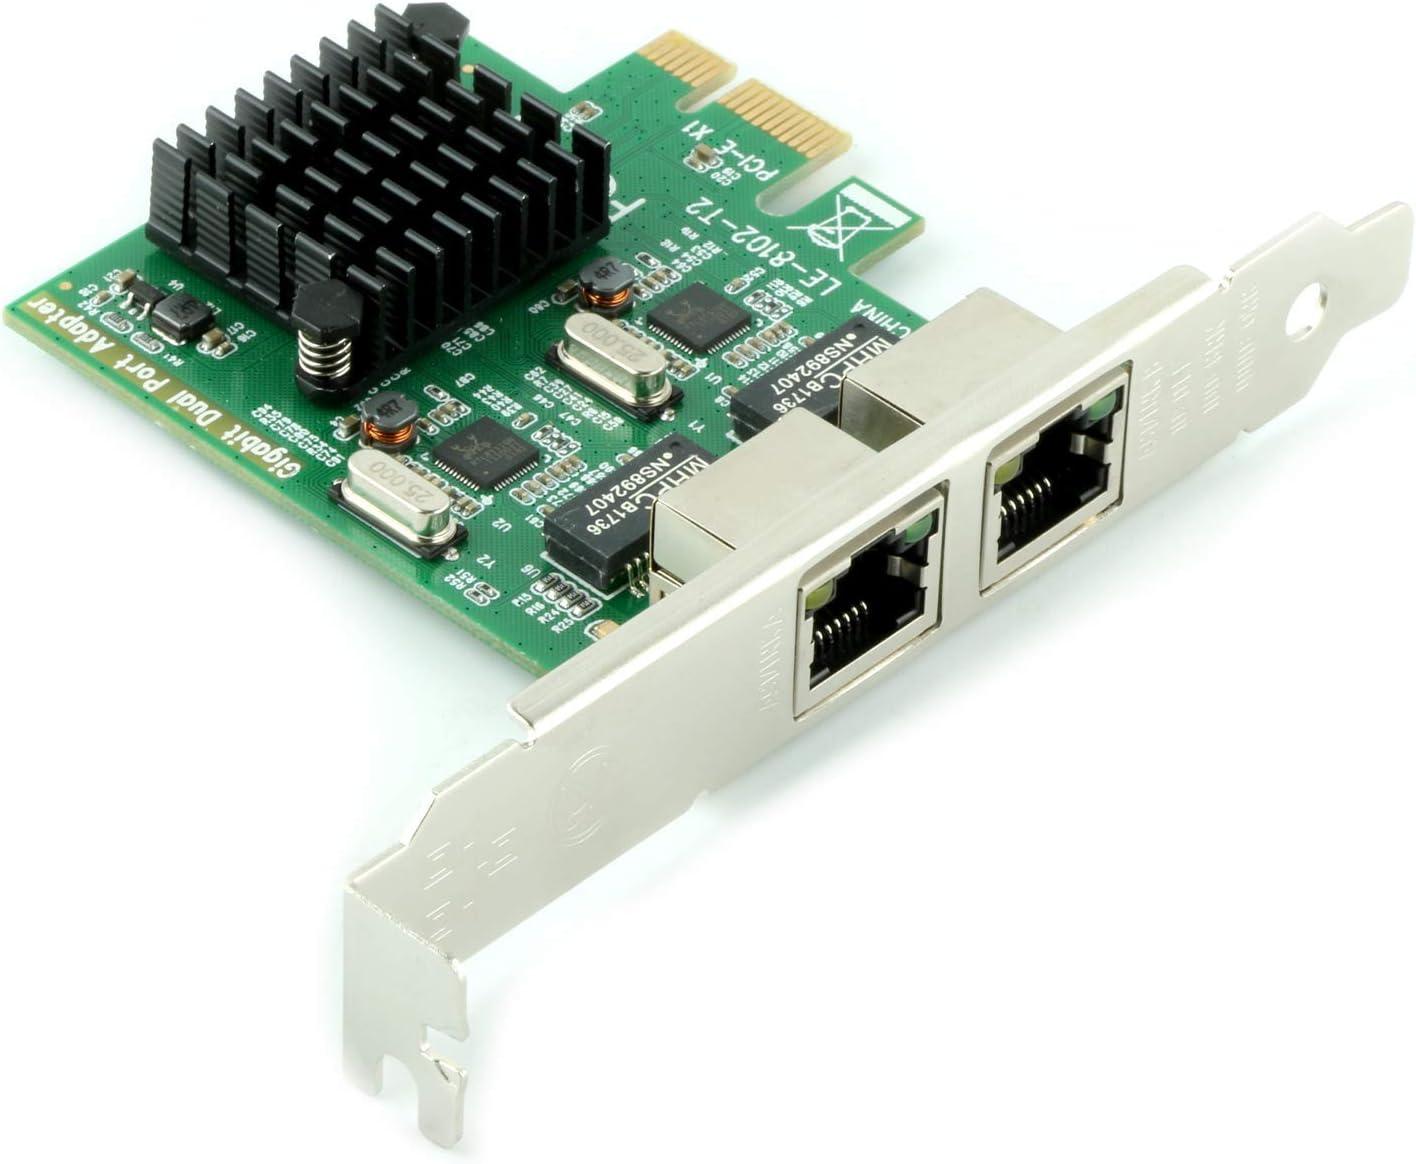 MeterMall Fresh for Ubit RJ45 x 2 Gigabit LAN Gigabit Ethernet PCI Express PCI-E Network Controller Card LAN Adapter Converter for Desktop PC